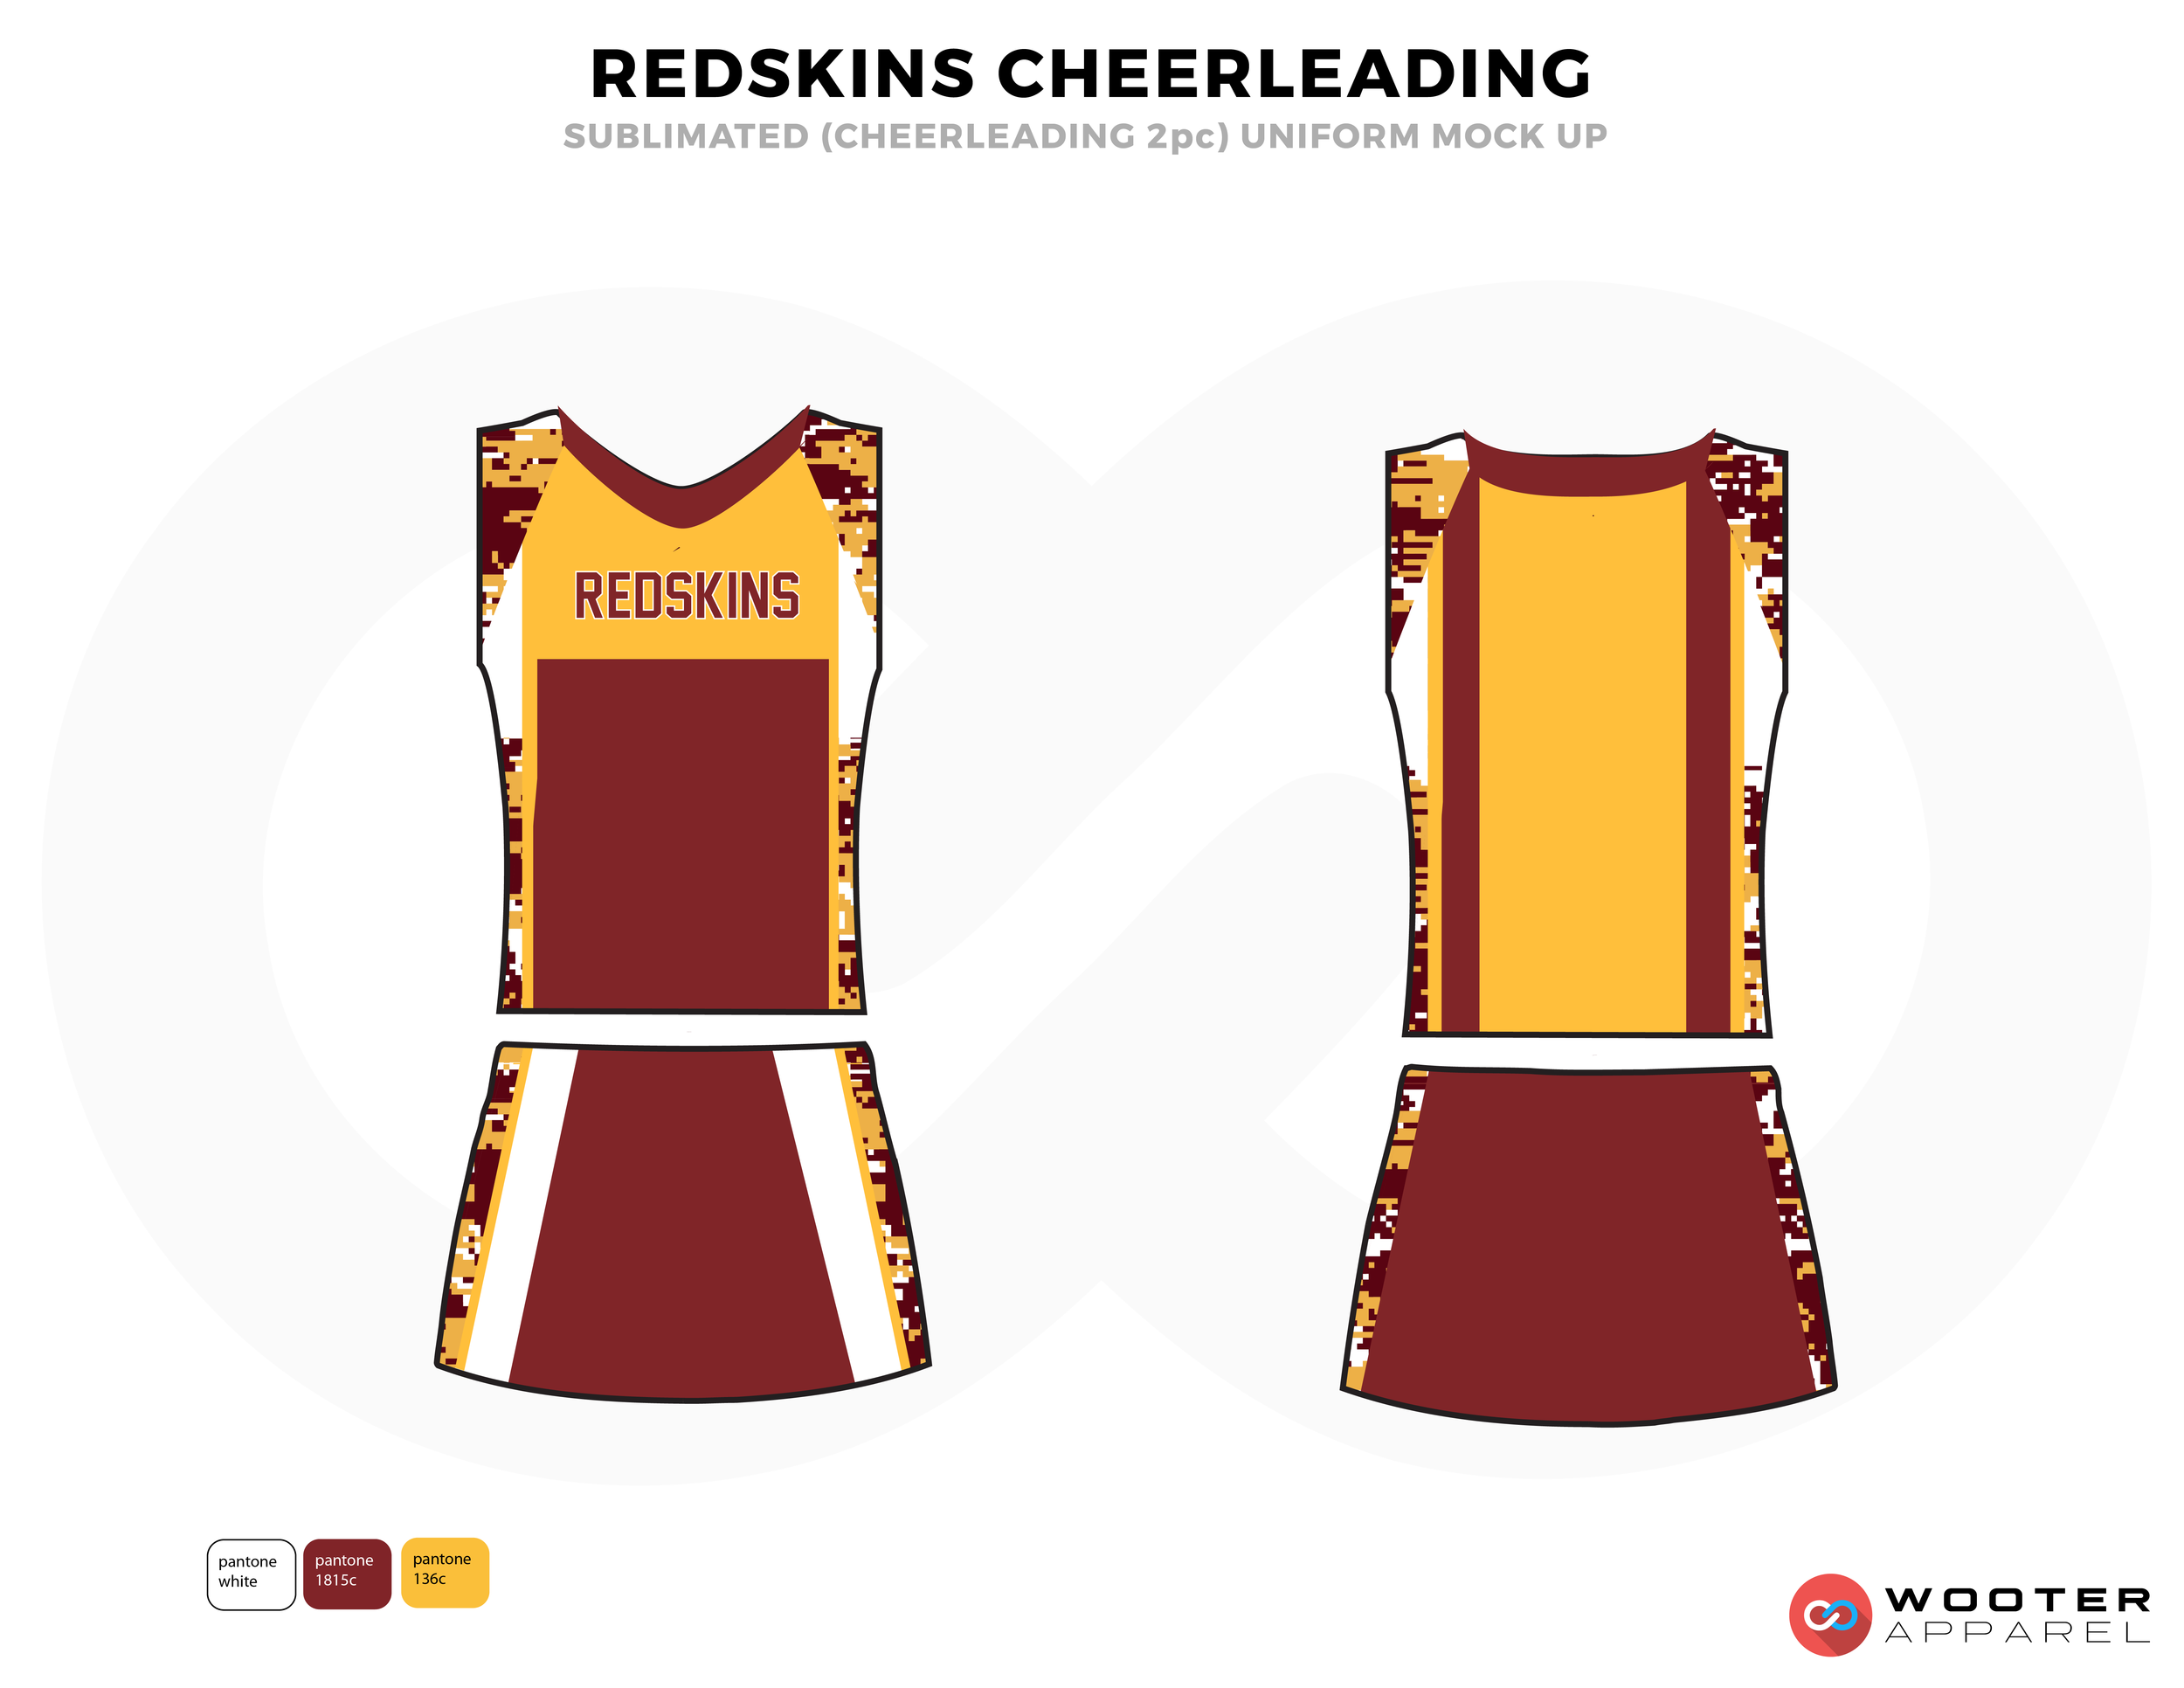 REDSKINS maroon yellow white cheerleading uniforms, top, and skirt